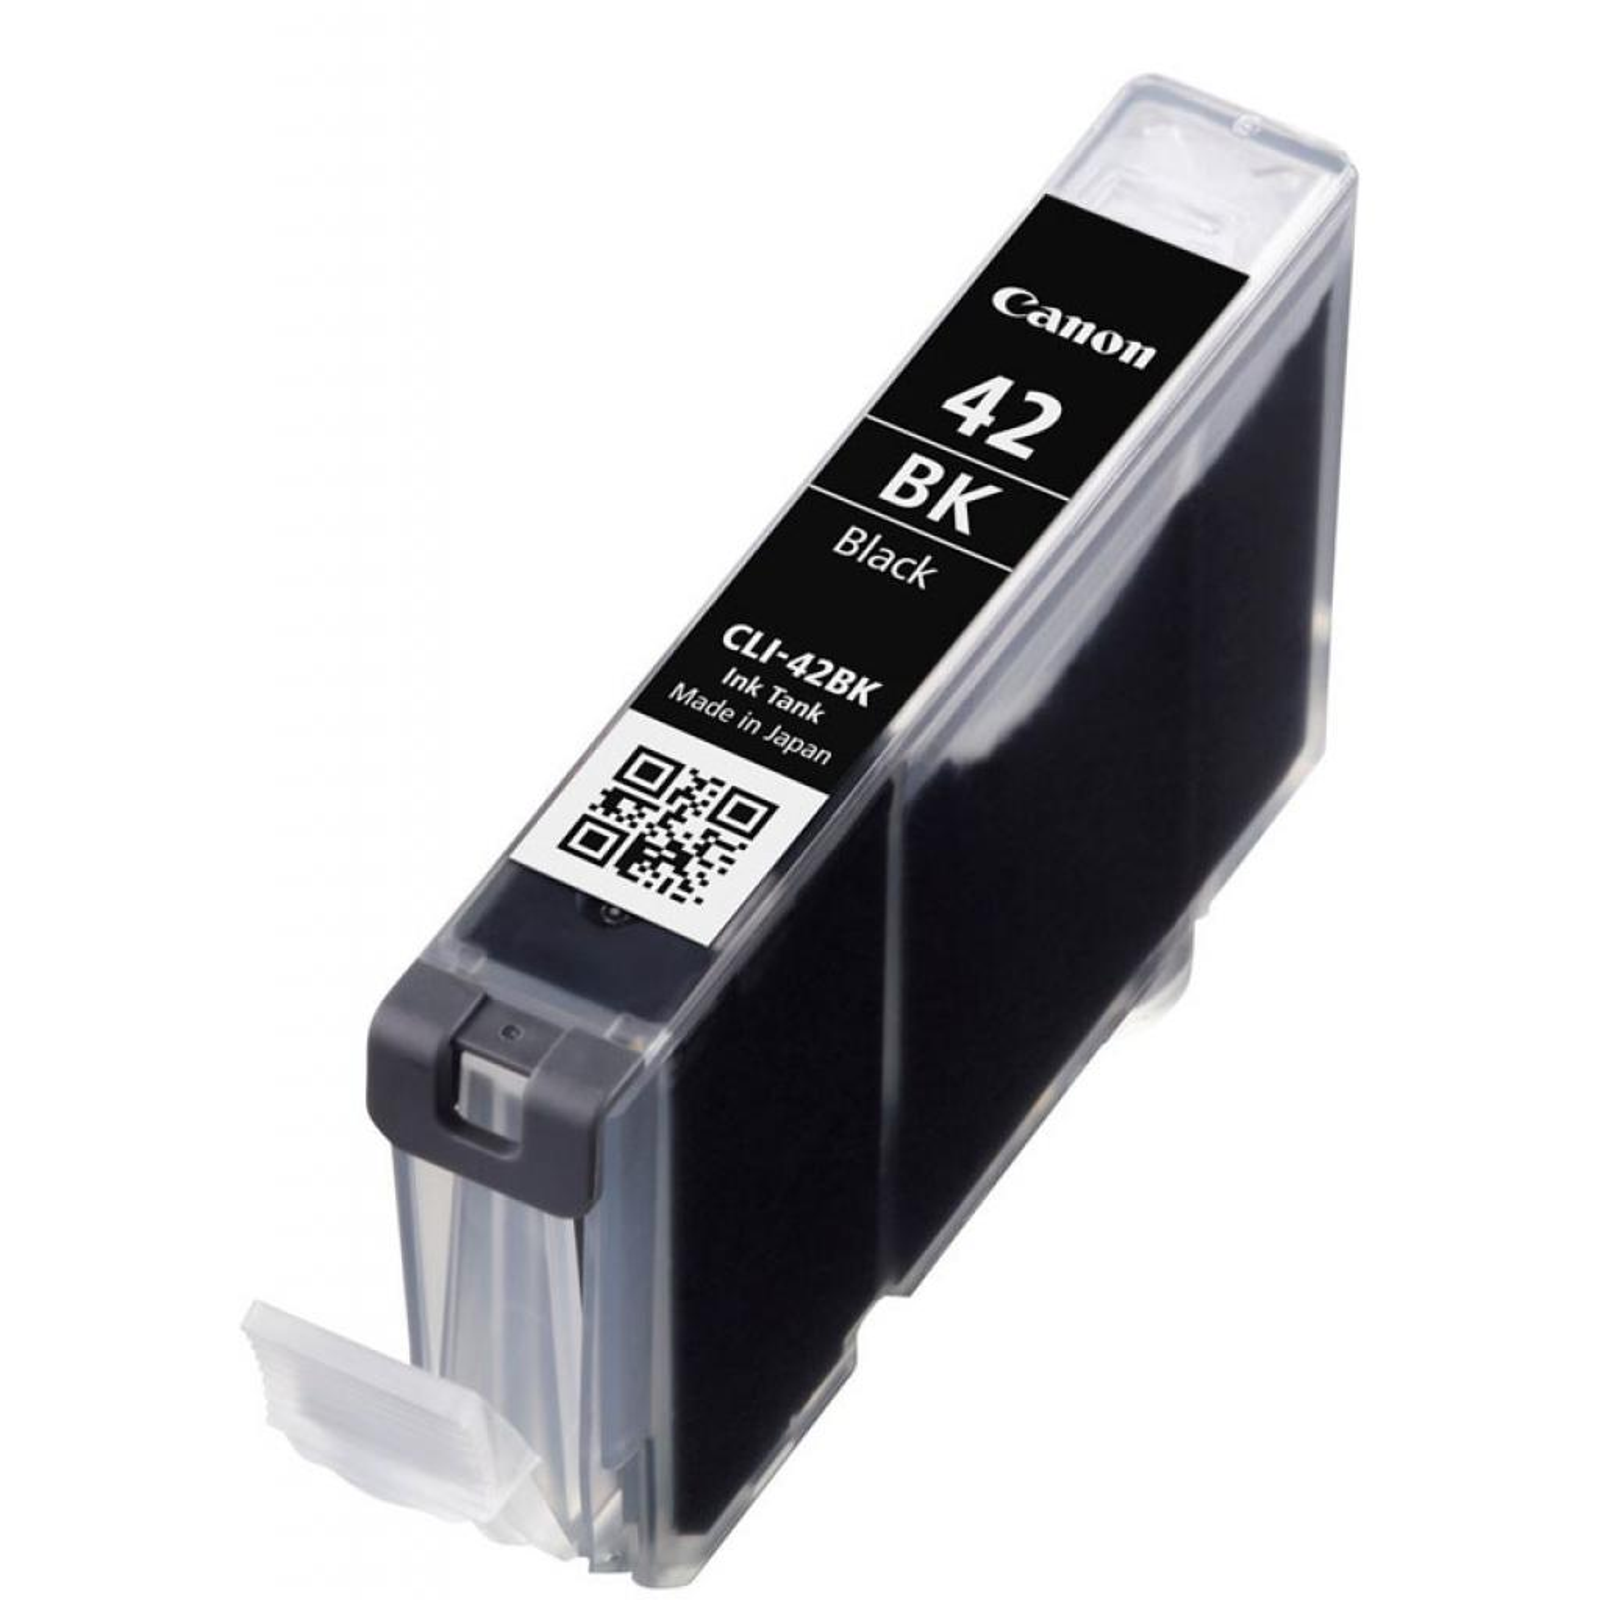 Картридж Canon CLI-42 Black для PIXMA PRO-100 (6384B001) изображение 3